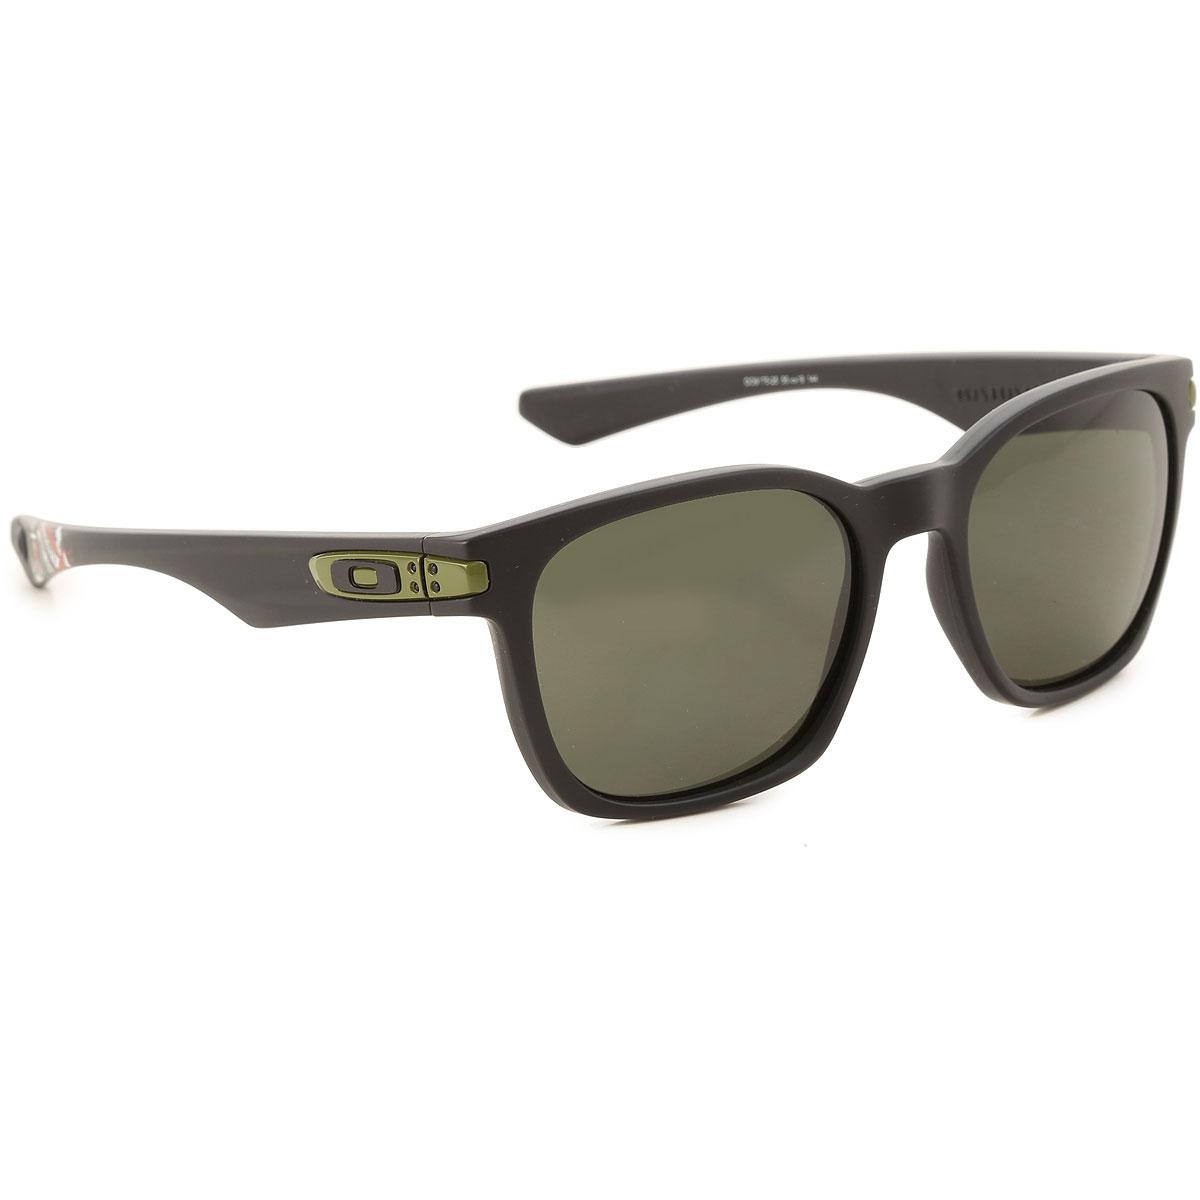 Oakley Sunglasses On Sale, Black Matt, 2019